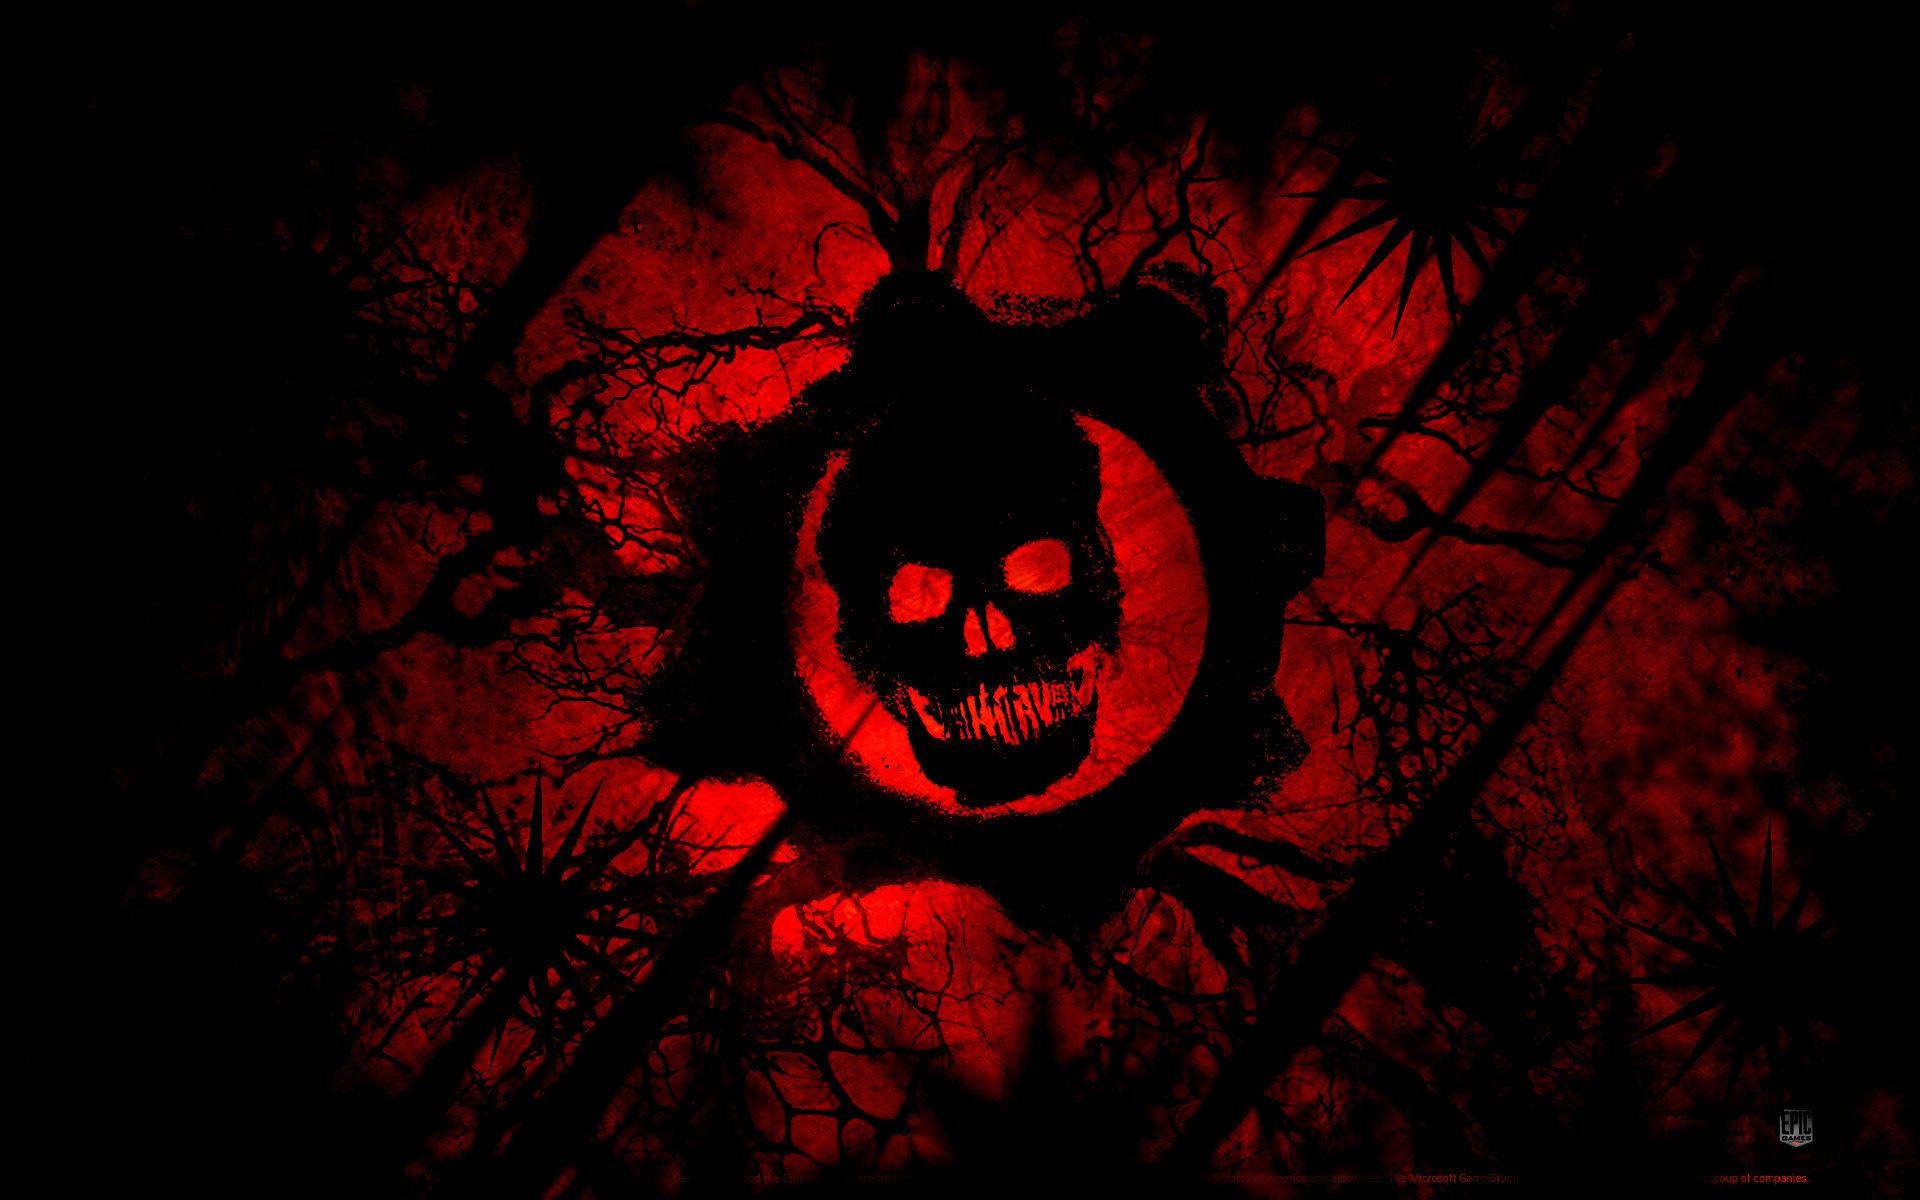 Gears of war 4 Logos.